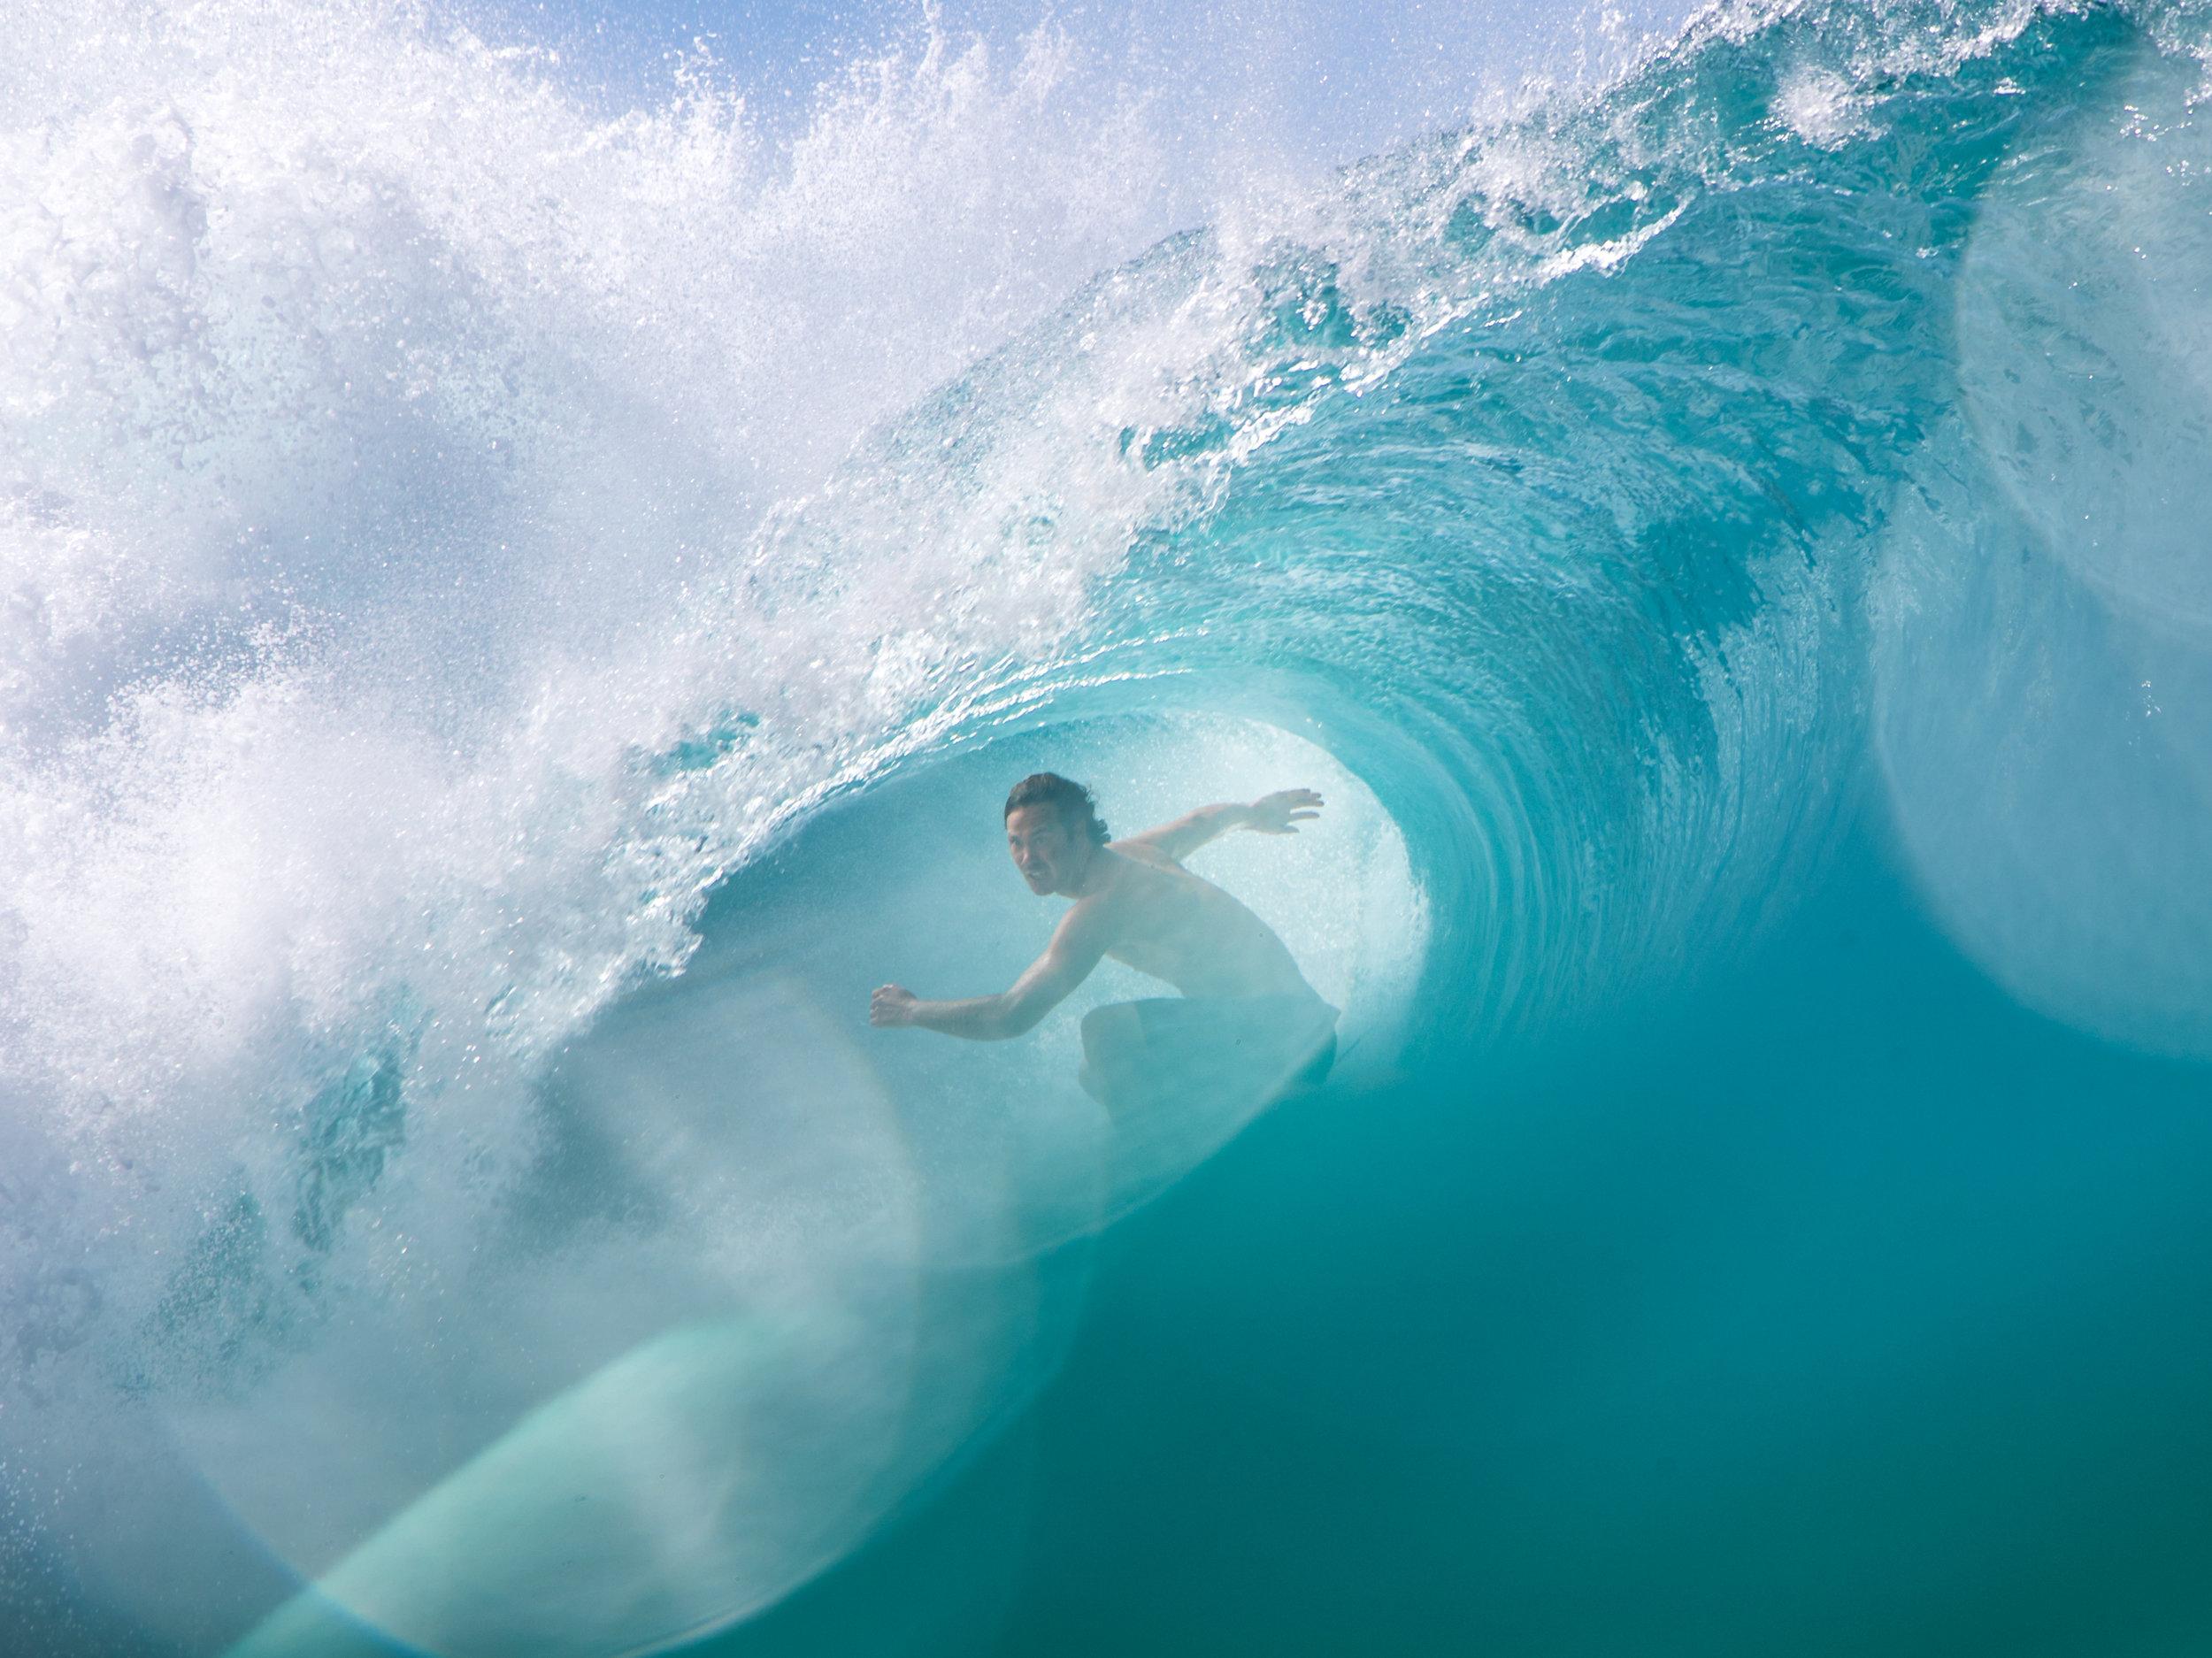 jordy smith pipeline surfing